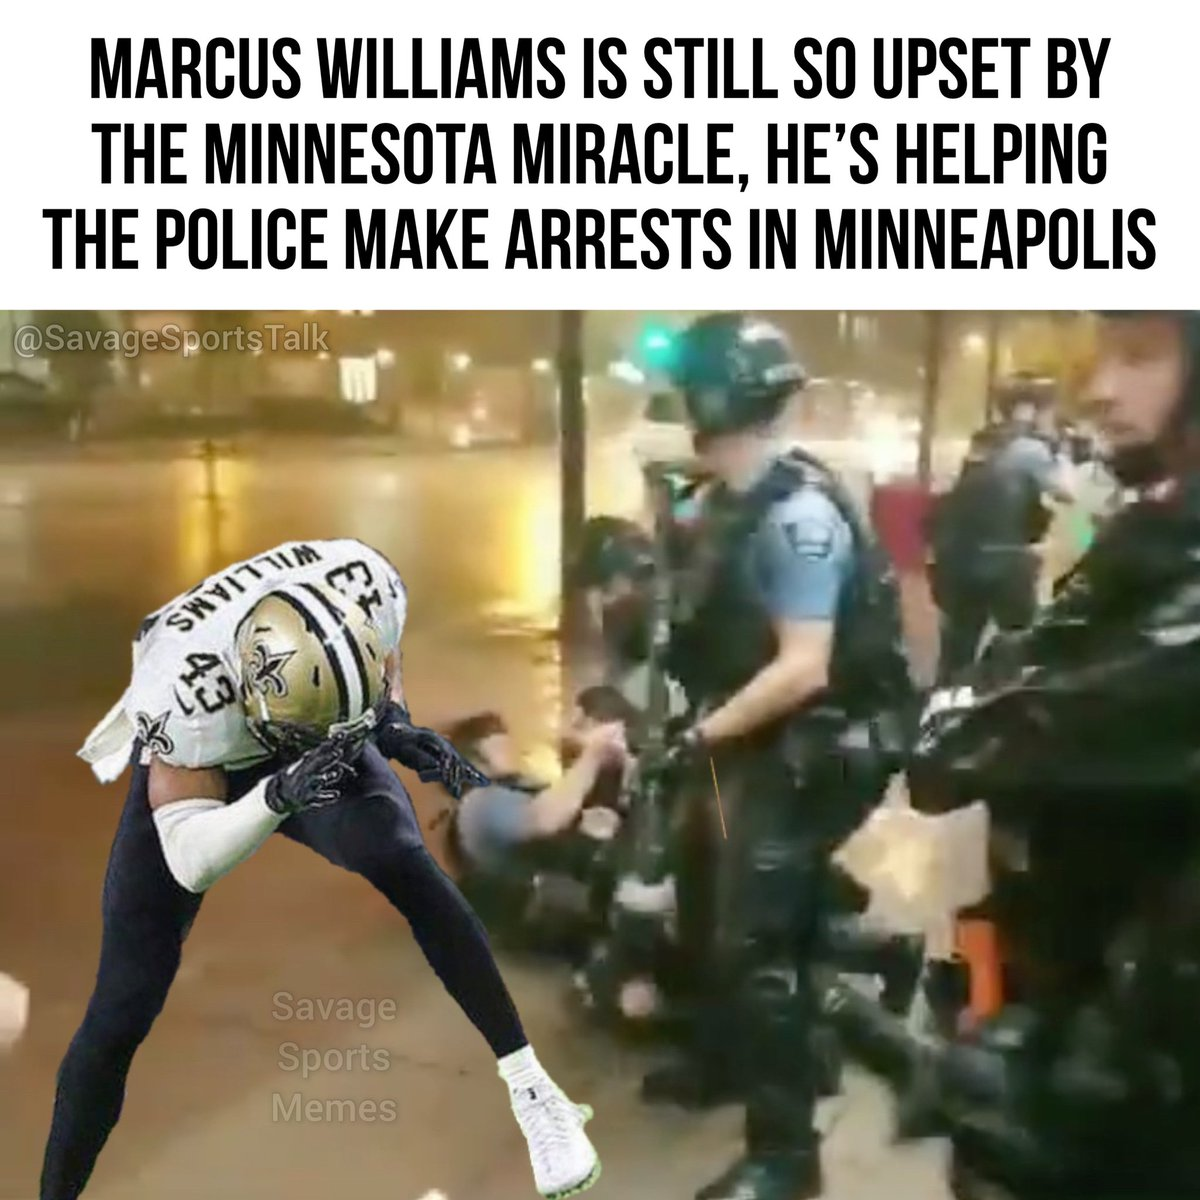 This is some next-level triggered stuff here! . .  #NFL #NFLmeme #NFLmemes #football #footballmeme #footballmemes #meme #memes #sports #sportsmeme #sportsmemes #minneapolis #minnesota #riots #vikings #minnesotavikings #skol #saints #neworleans #whodat #georgefloydpic.twitter.com/uOYpzj2TYn